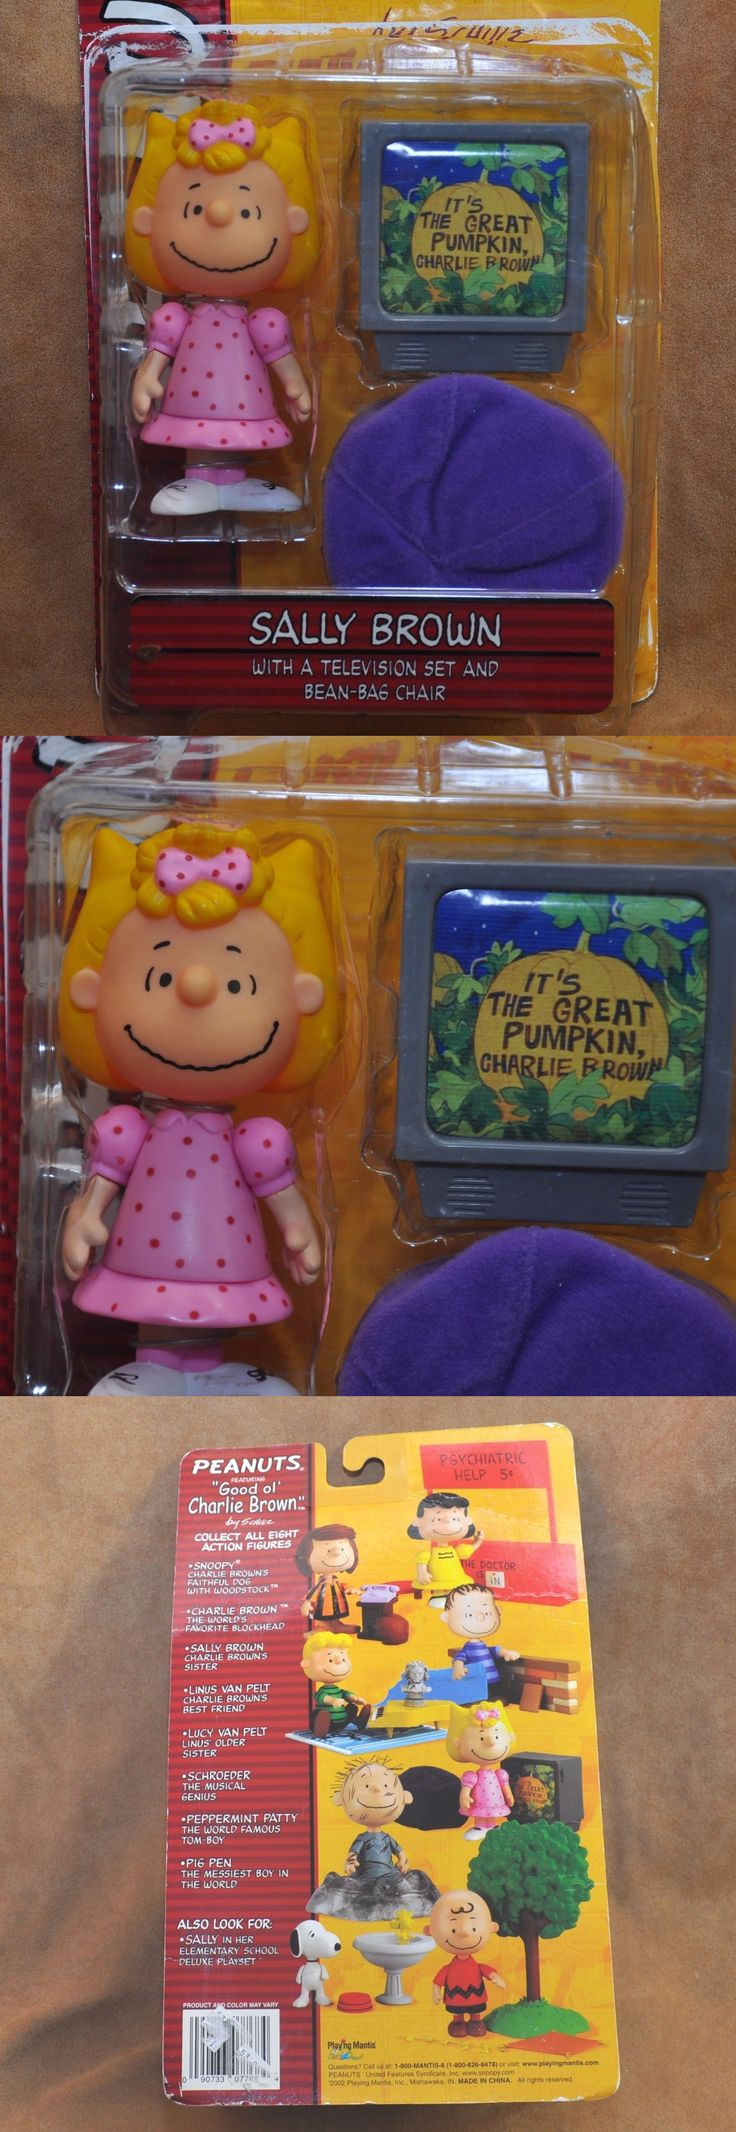 Peanuts Gang 773: Memory Lane Peanuts Sally Brown Figurine Set Beanbag And Tv Set Nip Grt Pumpkin -> BUY IT NOW ONLY: $32.99 on eBay!